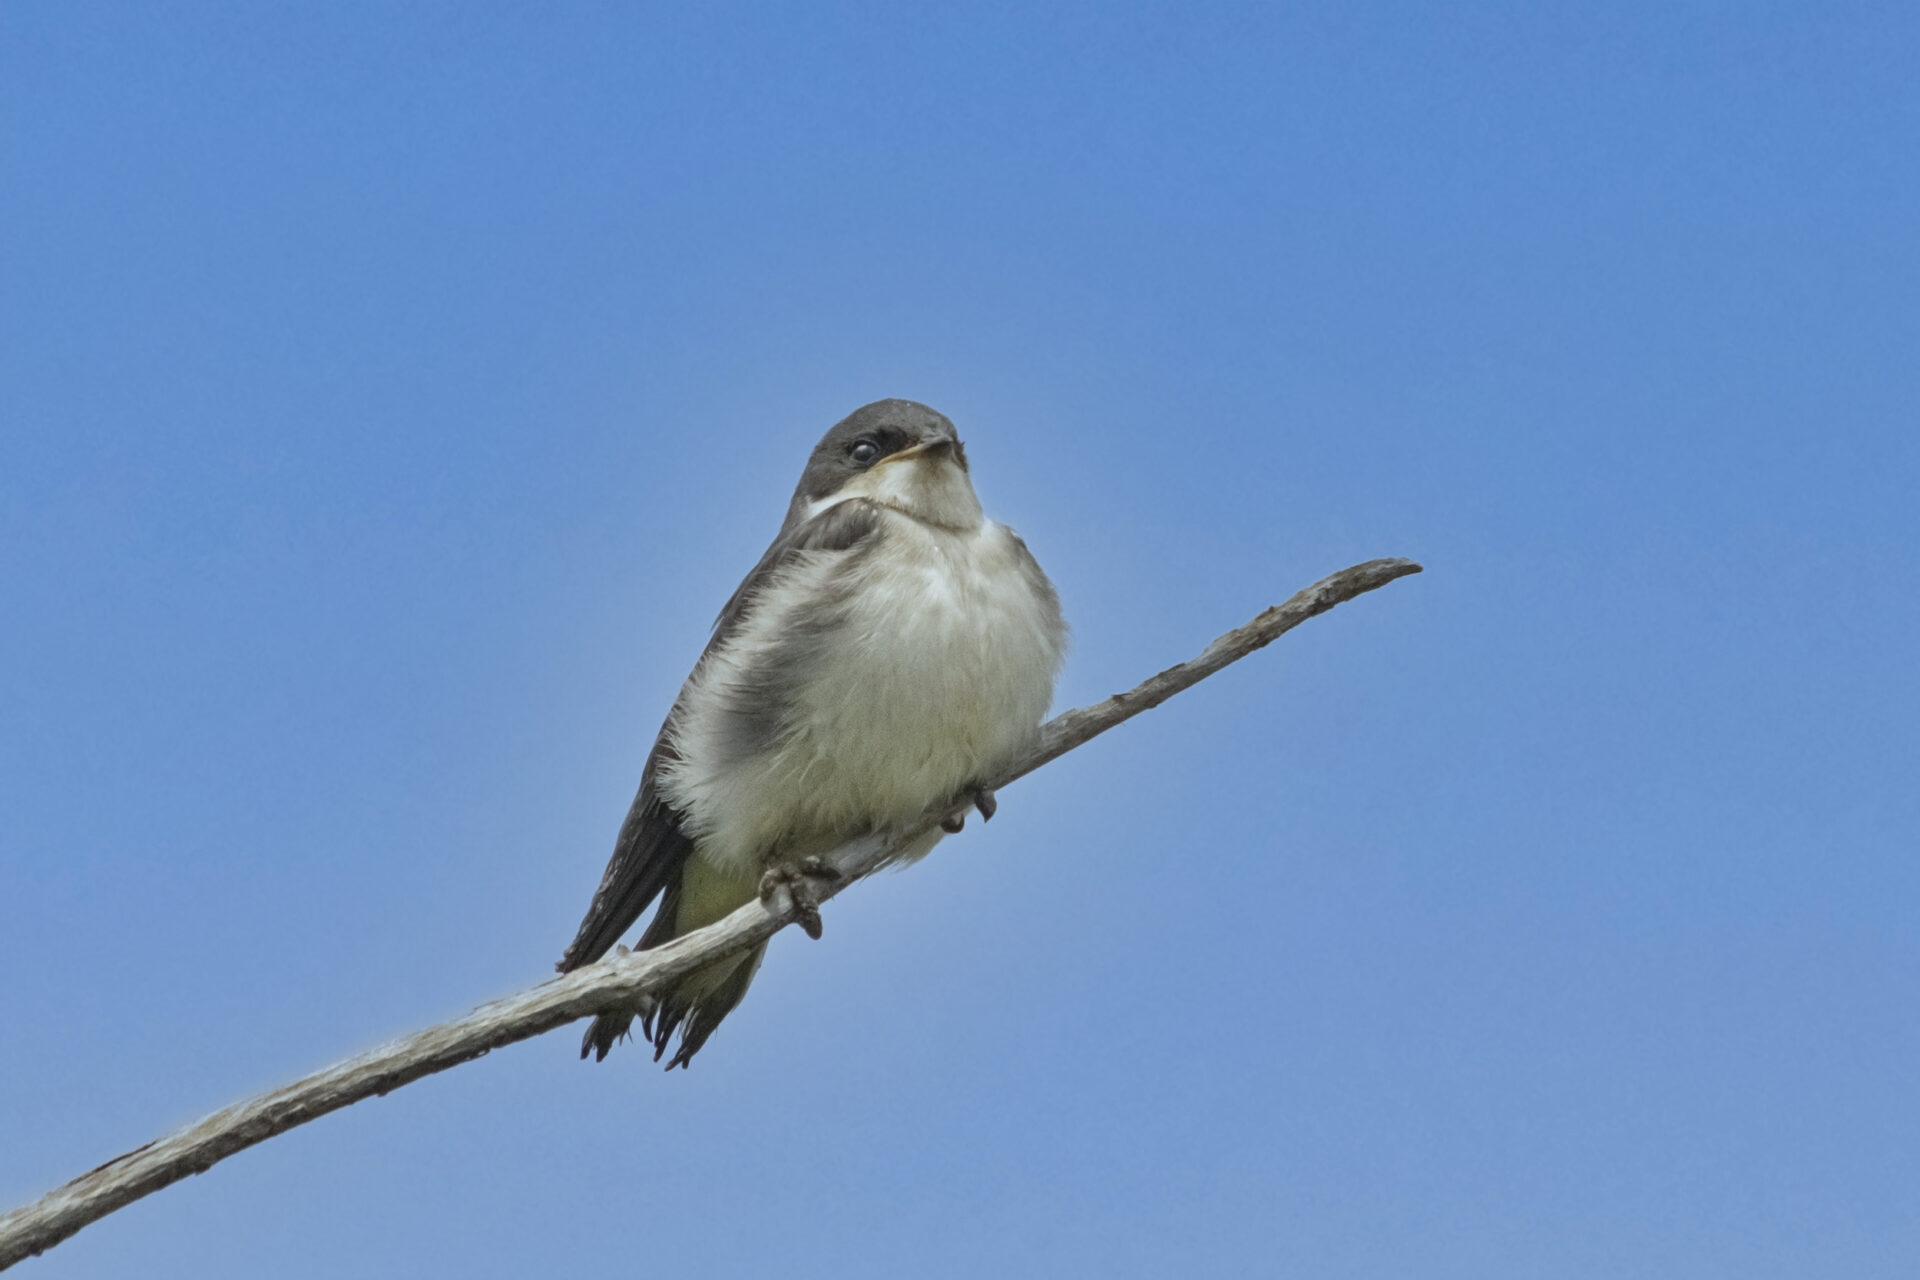 Juvenile Tree Swallow at Iona Beach, June 19 2021